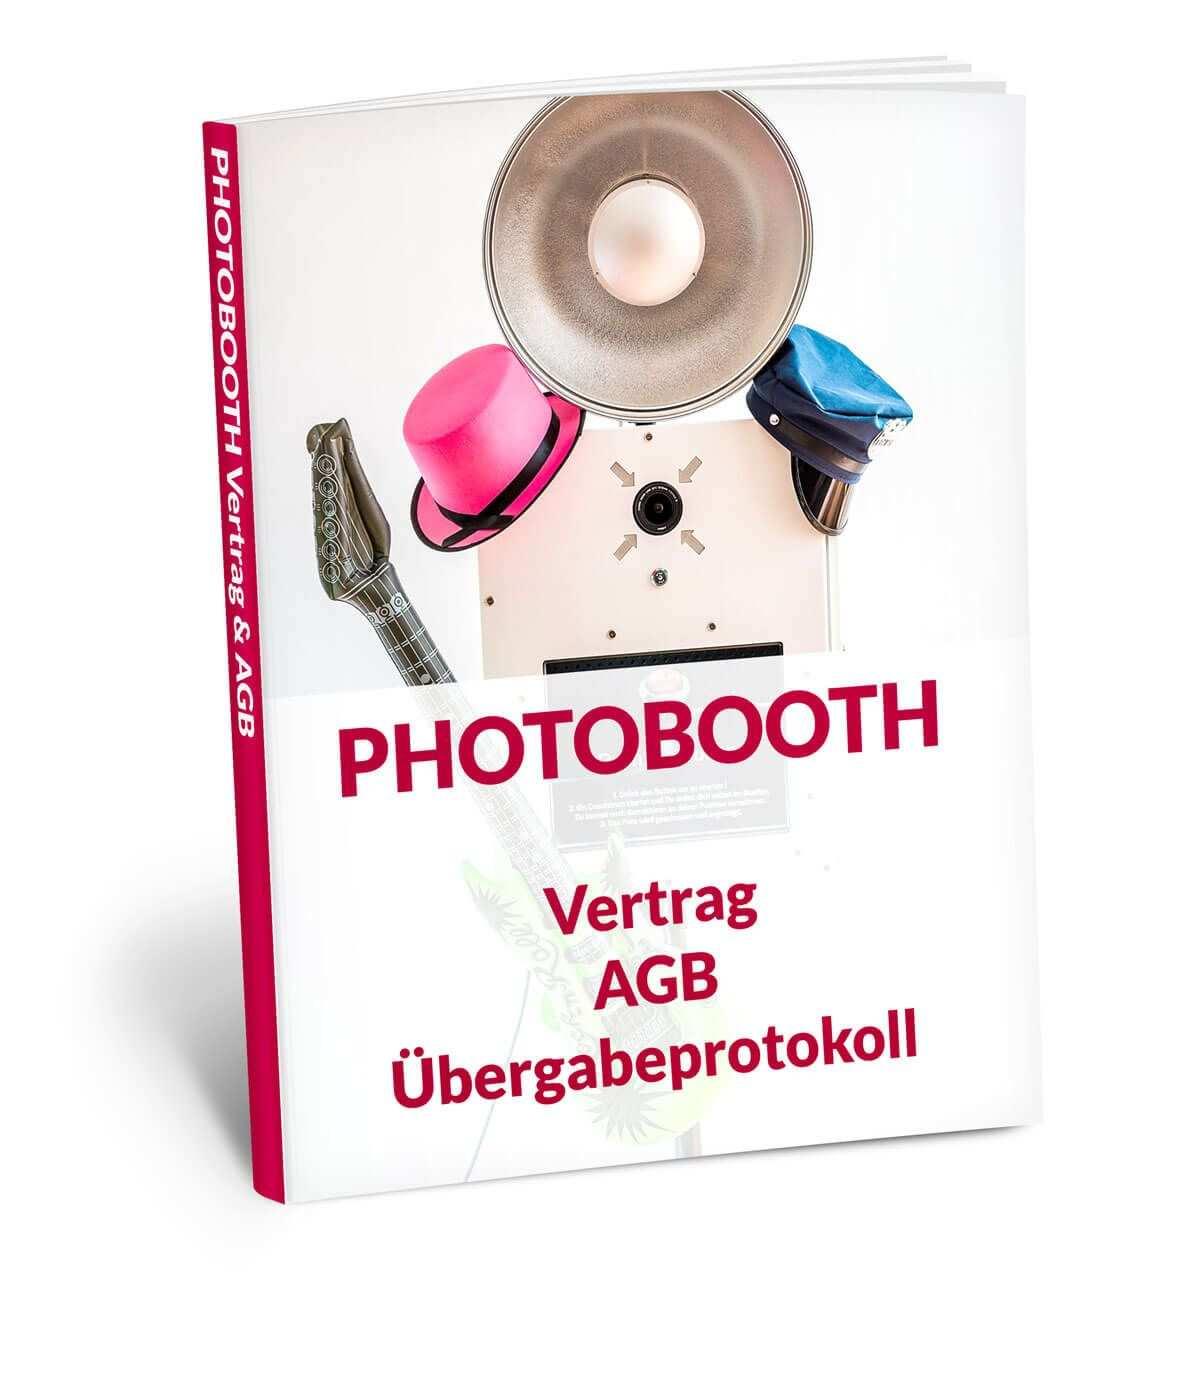 Photobooth Vertrag Fotobox Mietvertrag Agb Ubergabeprotokoll Diefotomanufaktur Fotostudio Winsen Fotokurs Hamburg Luneburg Winsen Photobooth Hamburg Fotobox Hamburg Shops Fotostudio